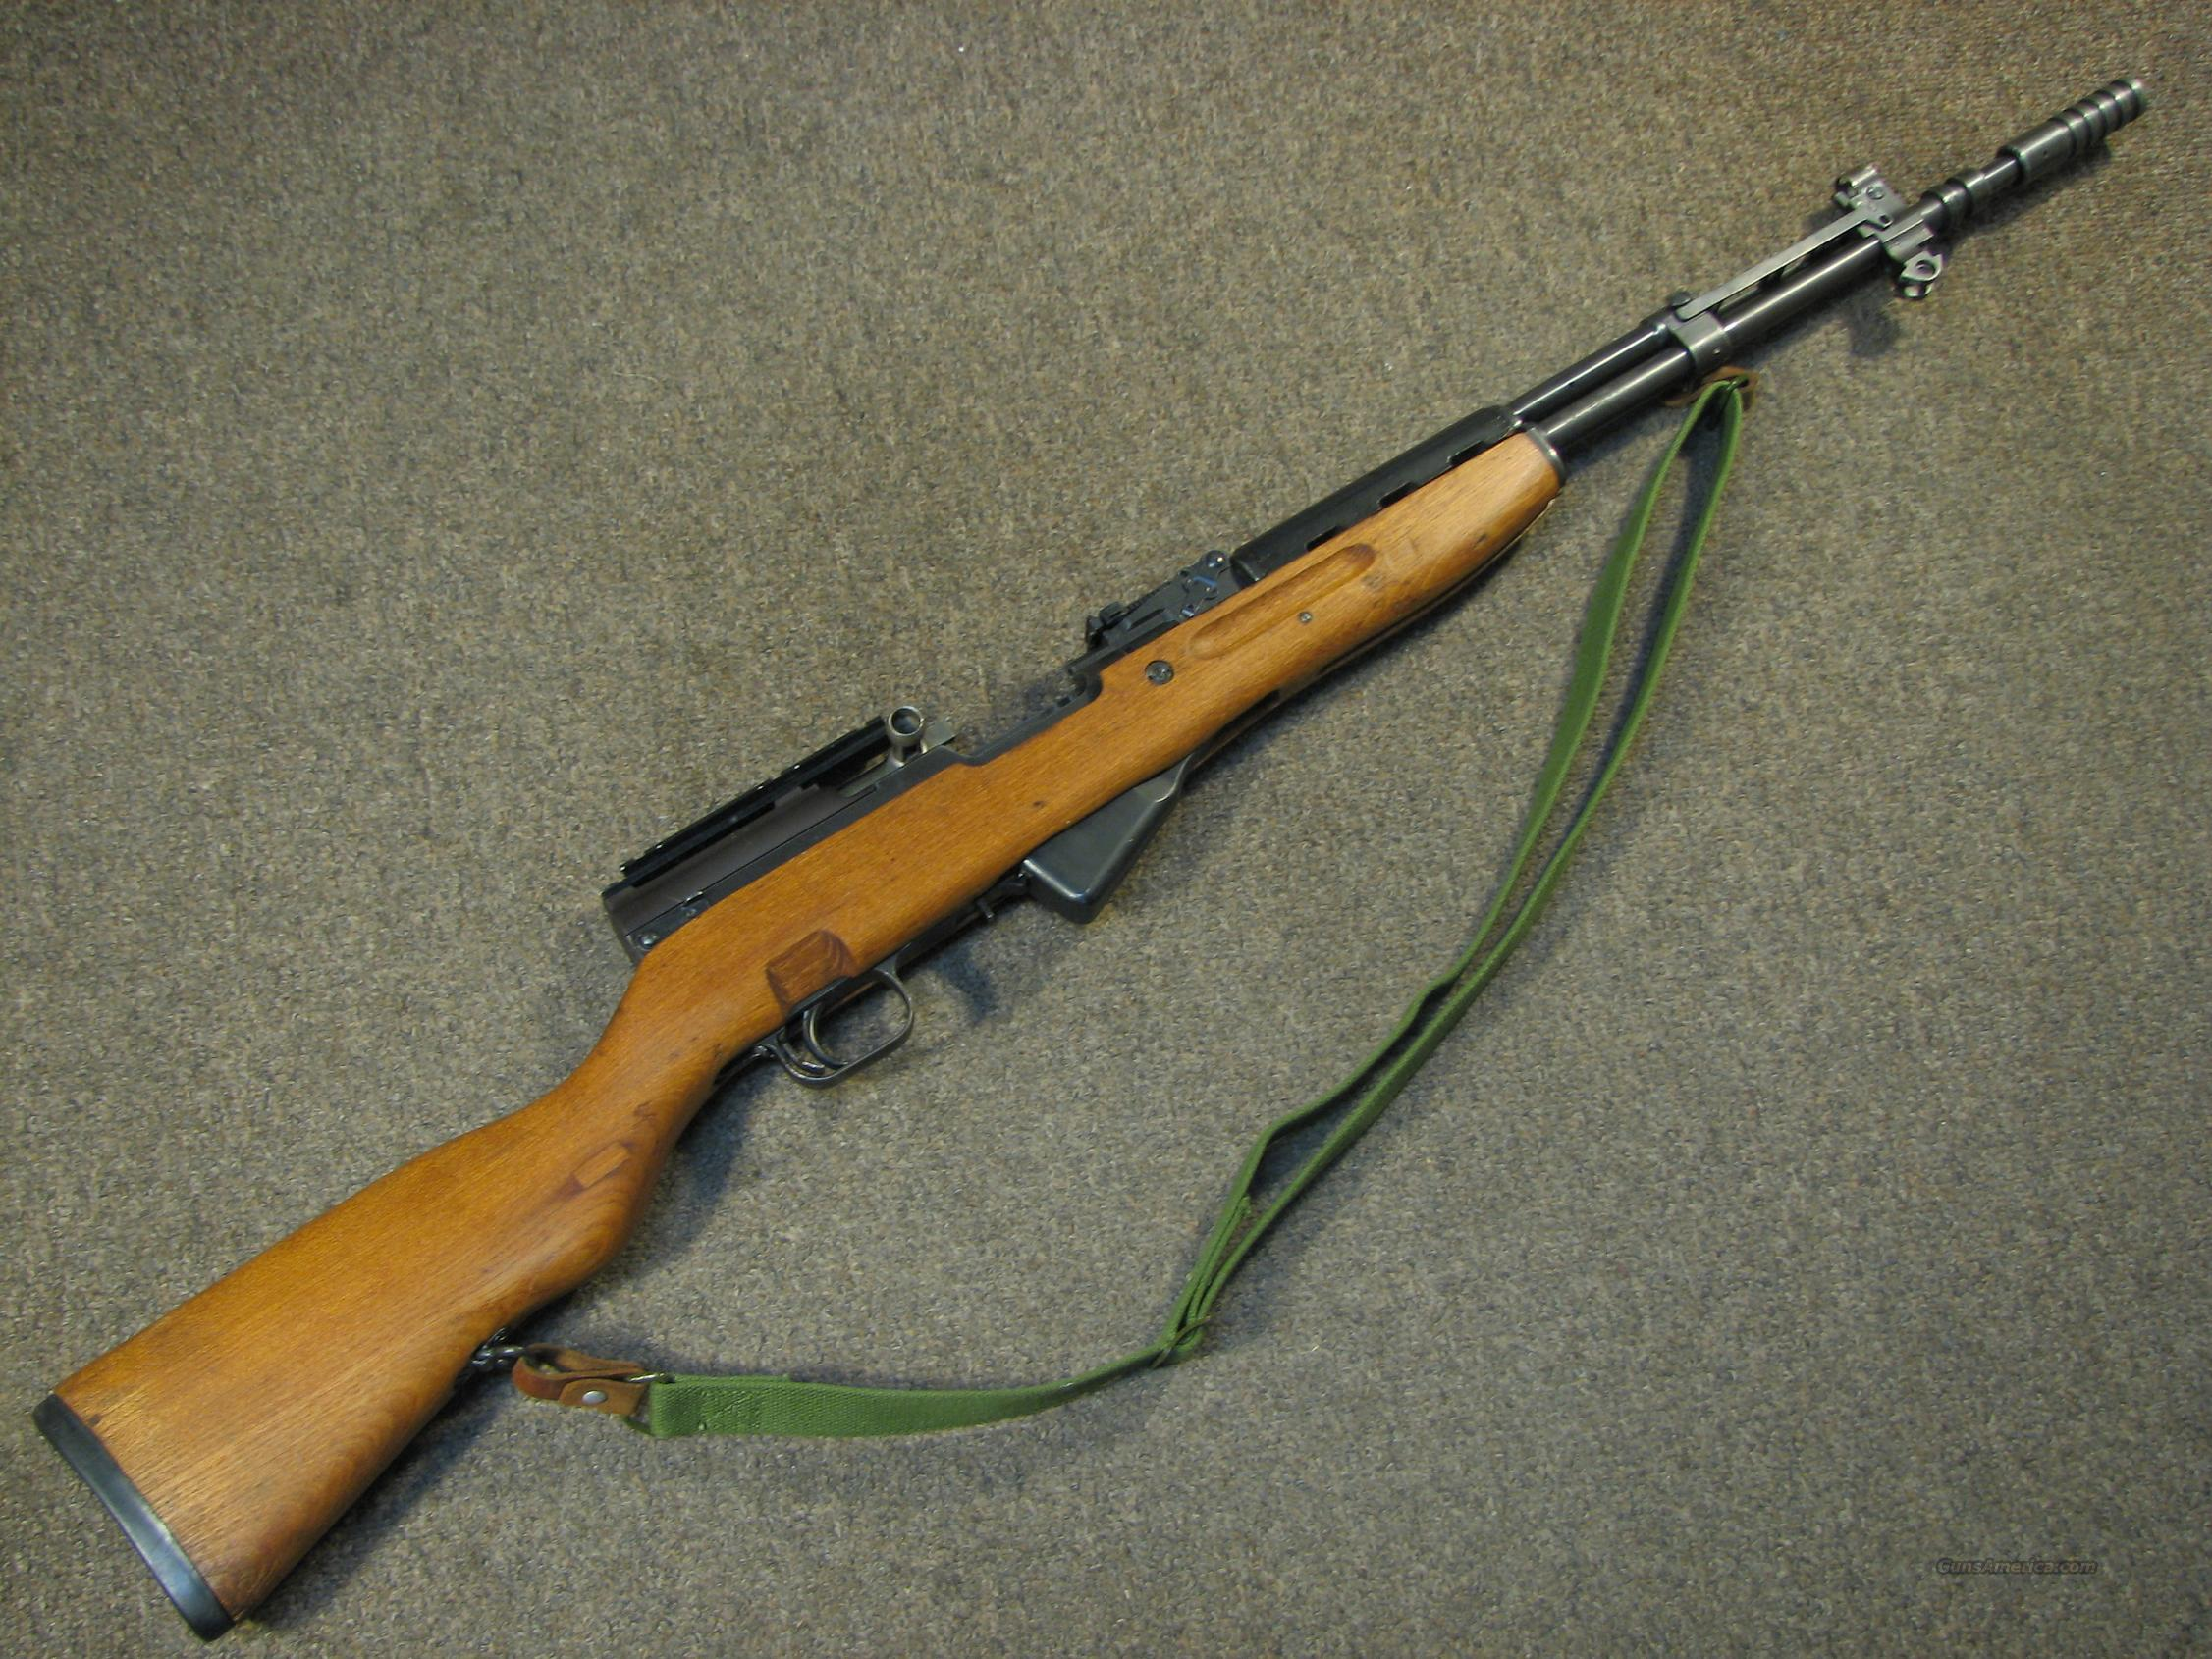 YUGO SKS 7.62x39 - w/ Grenade Launcher for sale